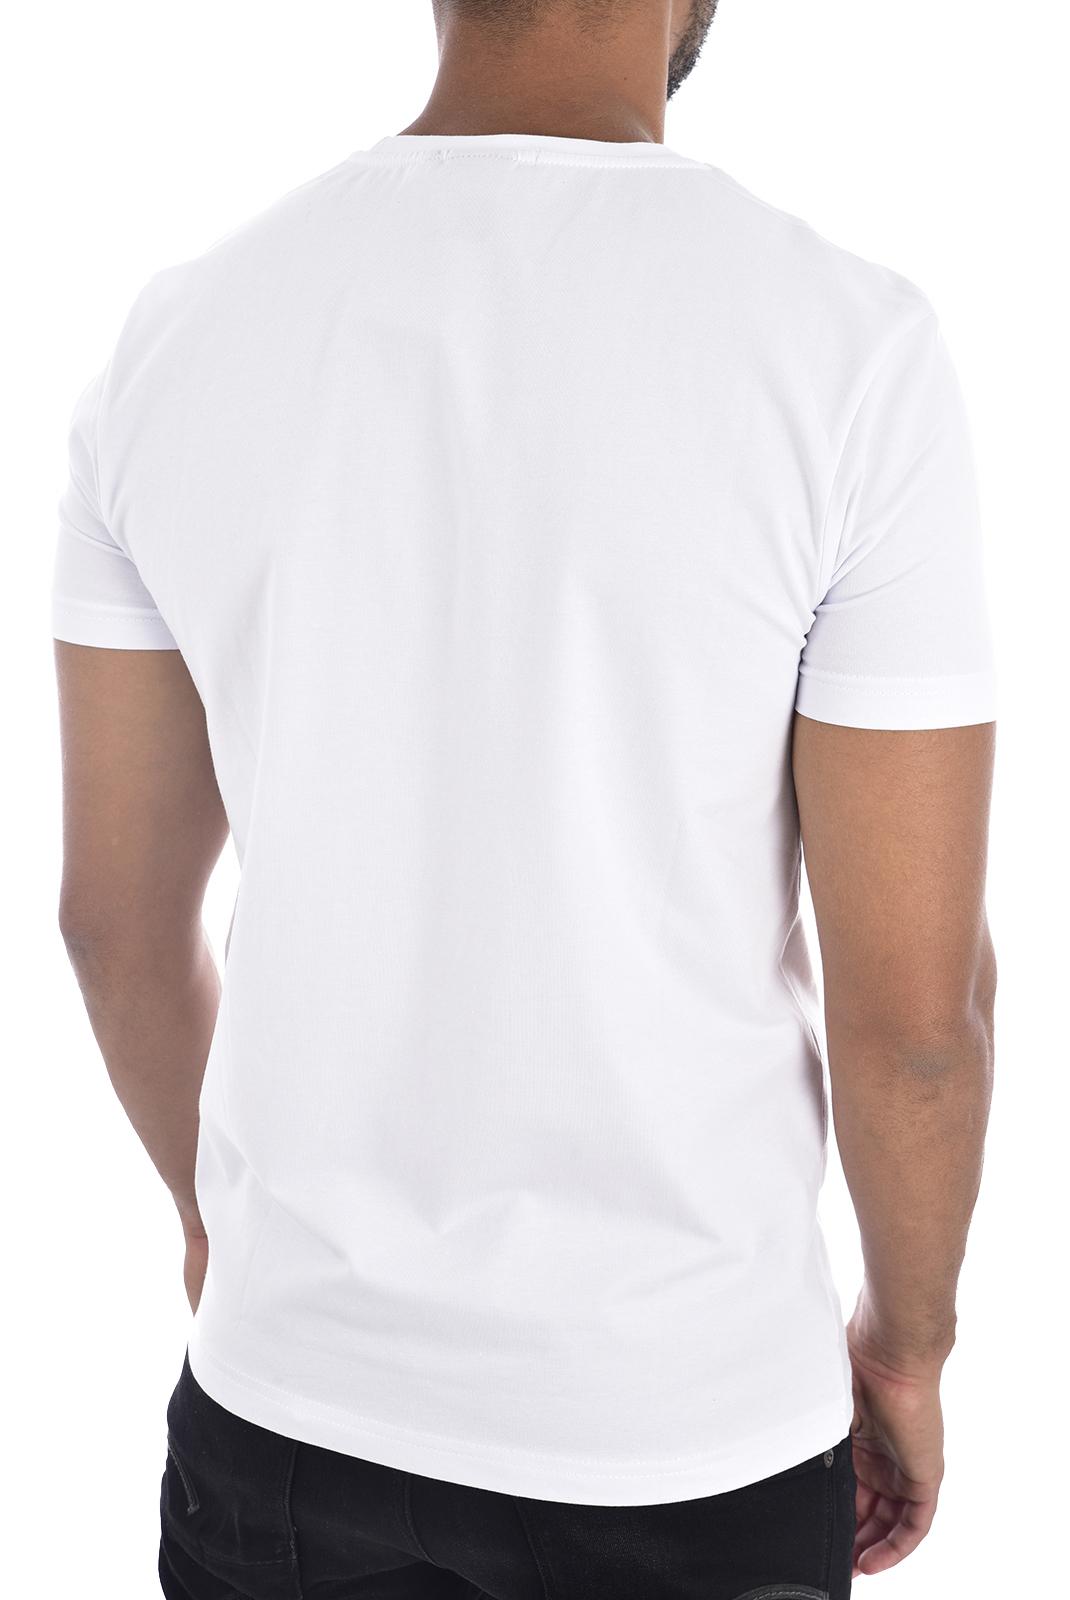 Tee-shirts  Redskins RICH CALDER WHITE